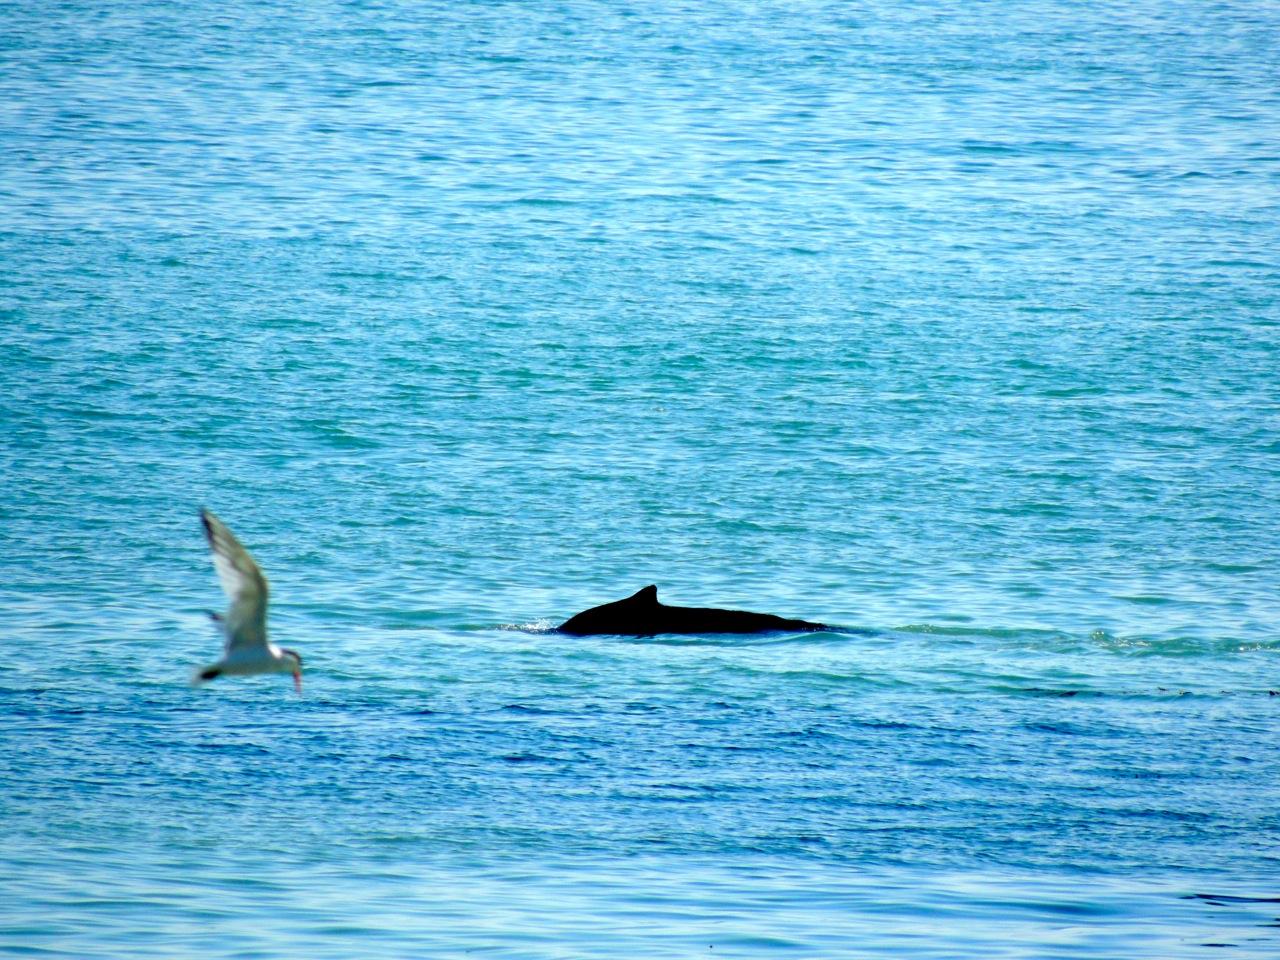 Double whammy: Humpback whale and Elegant (or Caspian) tern.